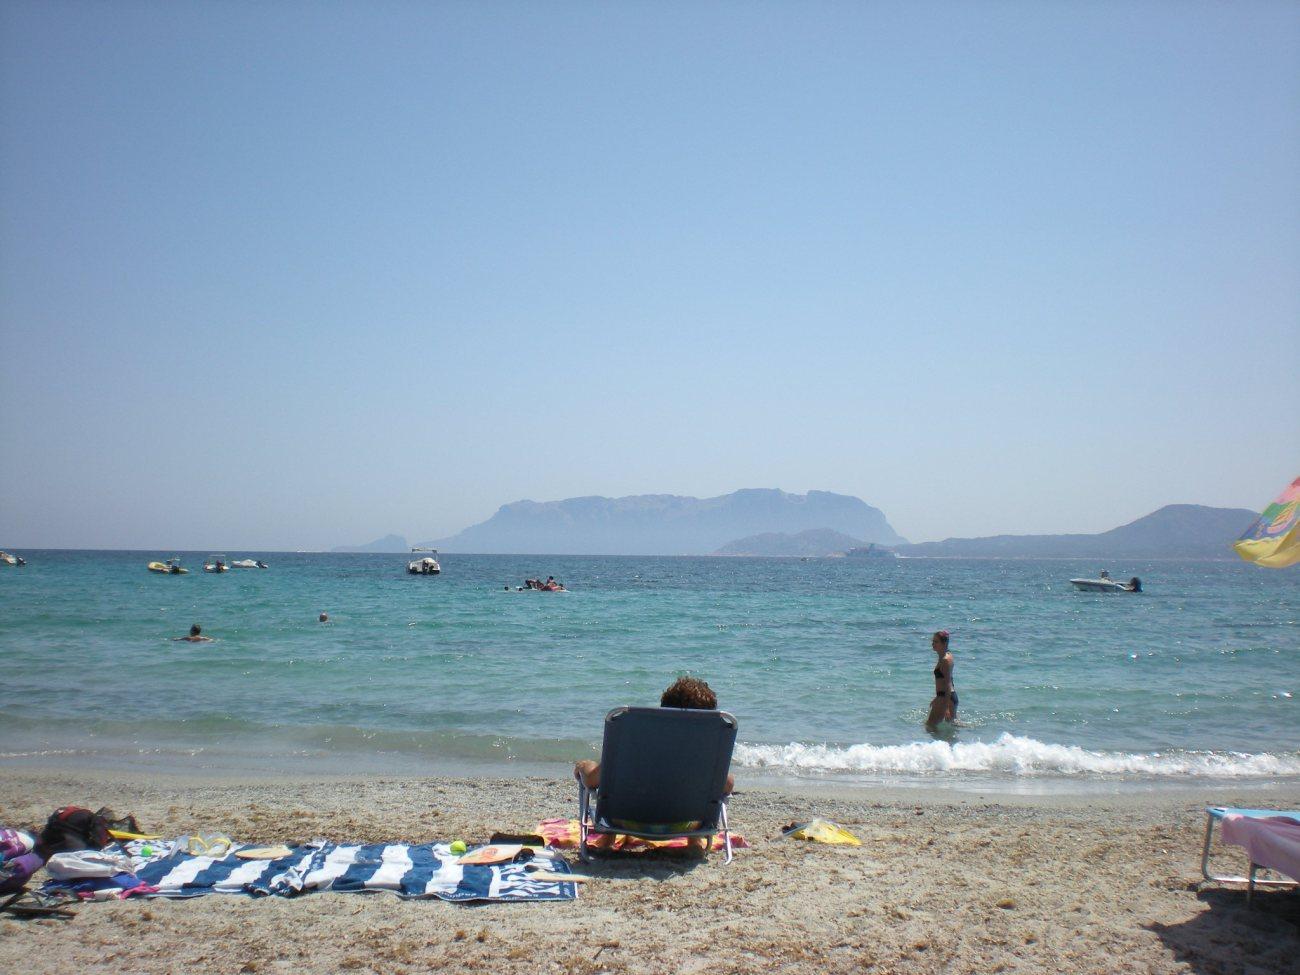 Pittulungu beach, Olbia, Sardinia